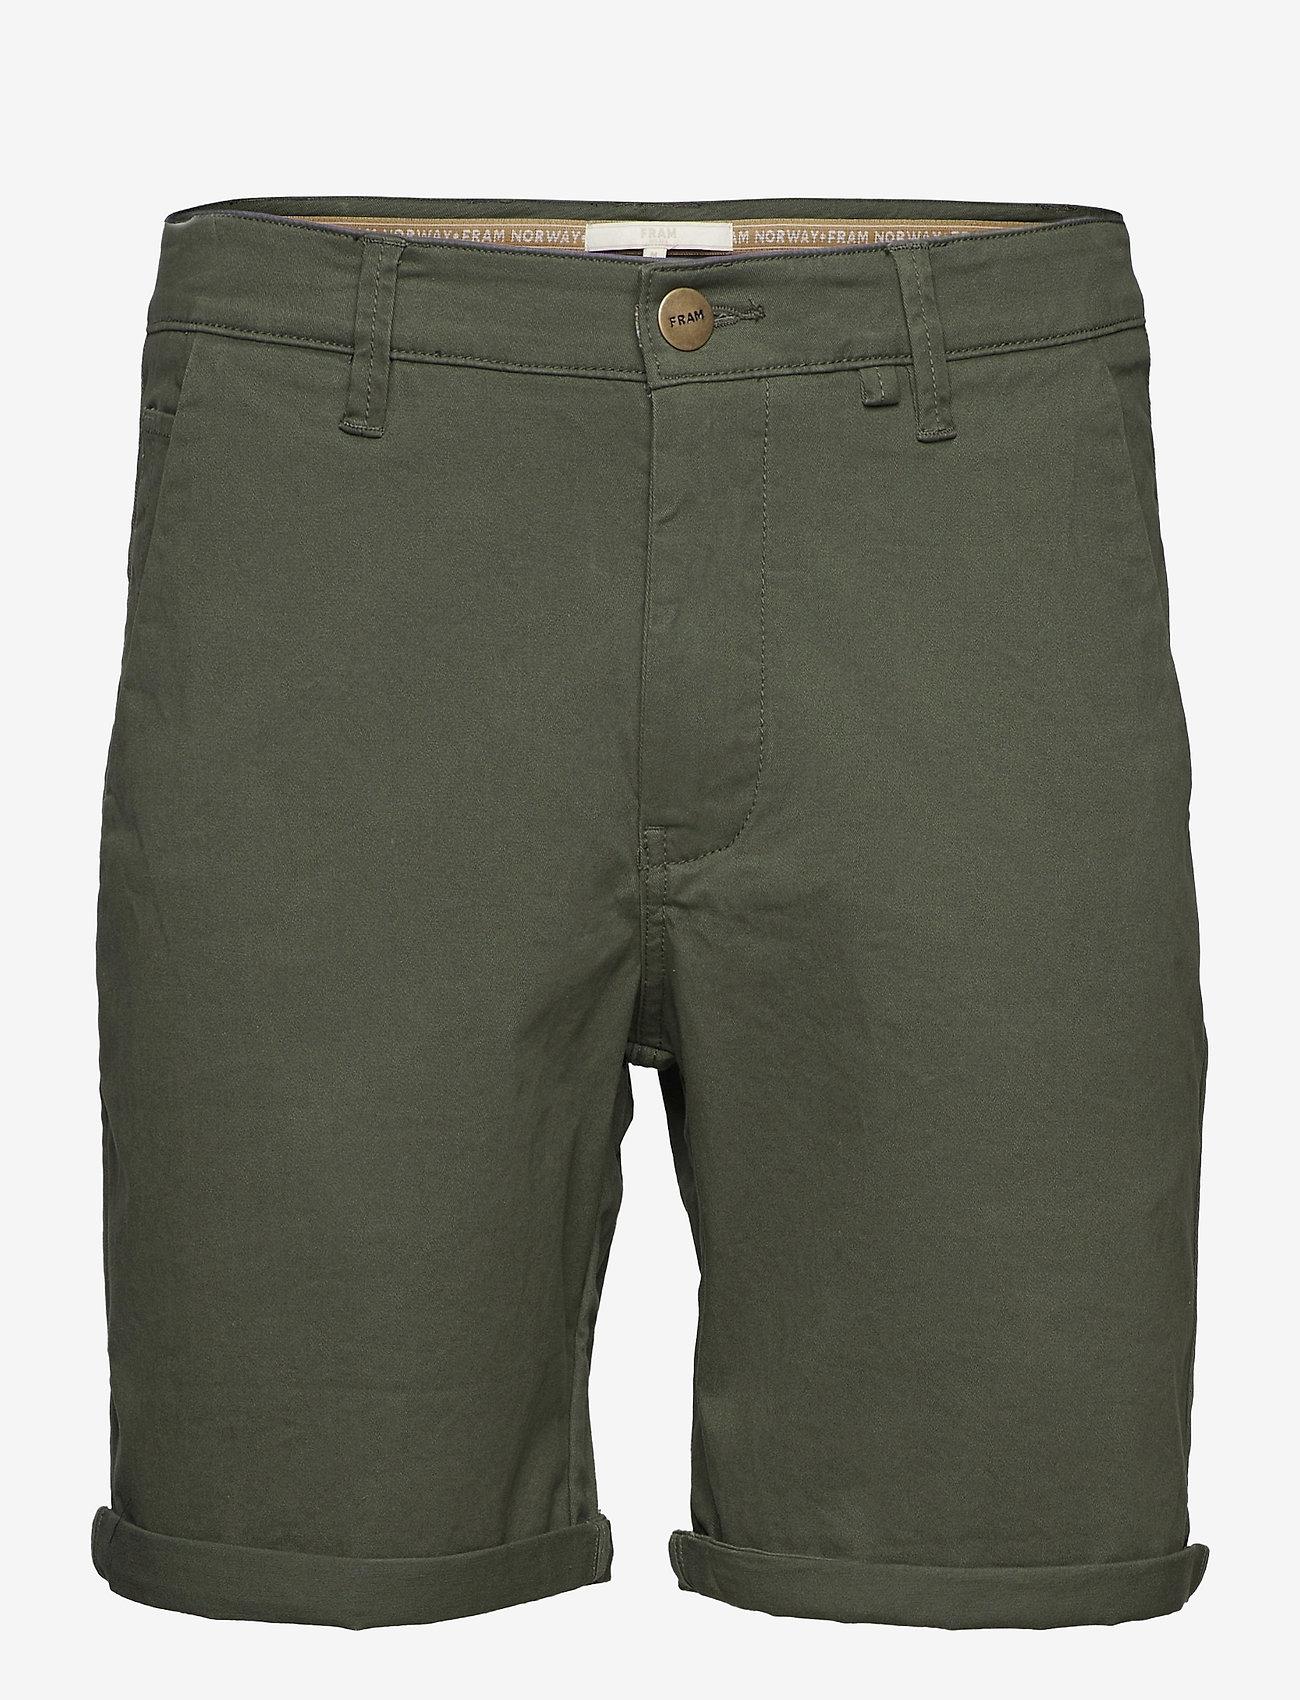 FRAM - Bygdøy Shorts - chinos shorts - deep lichen green - 0